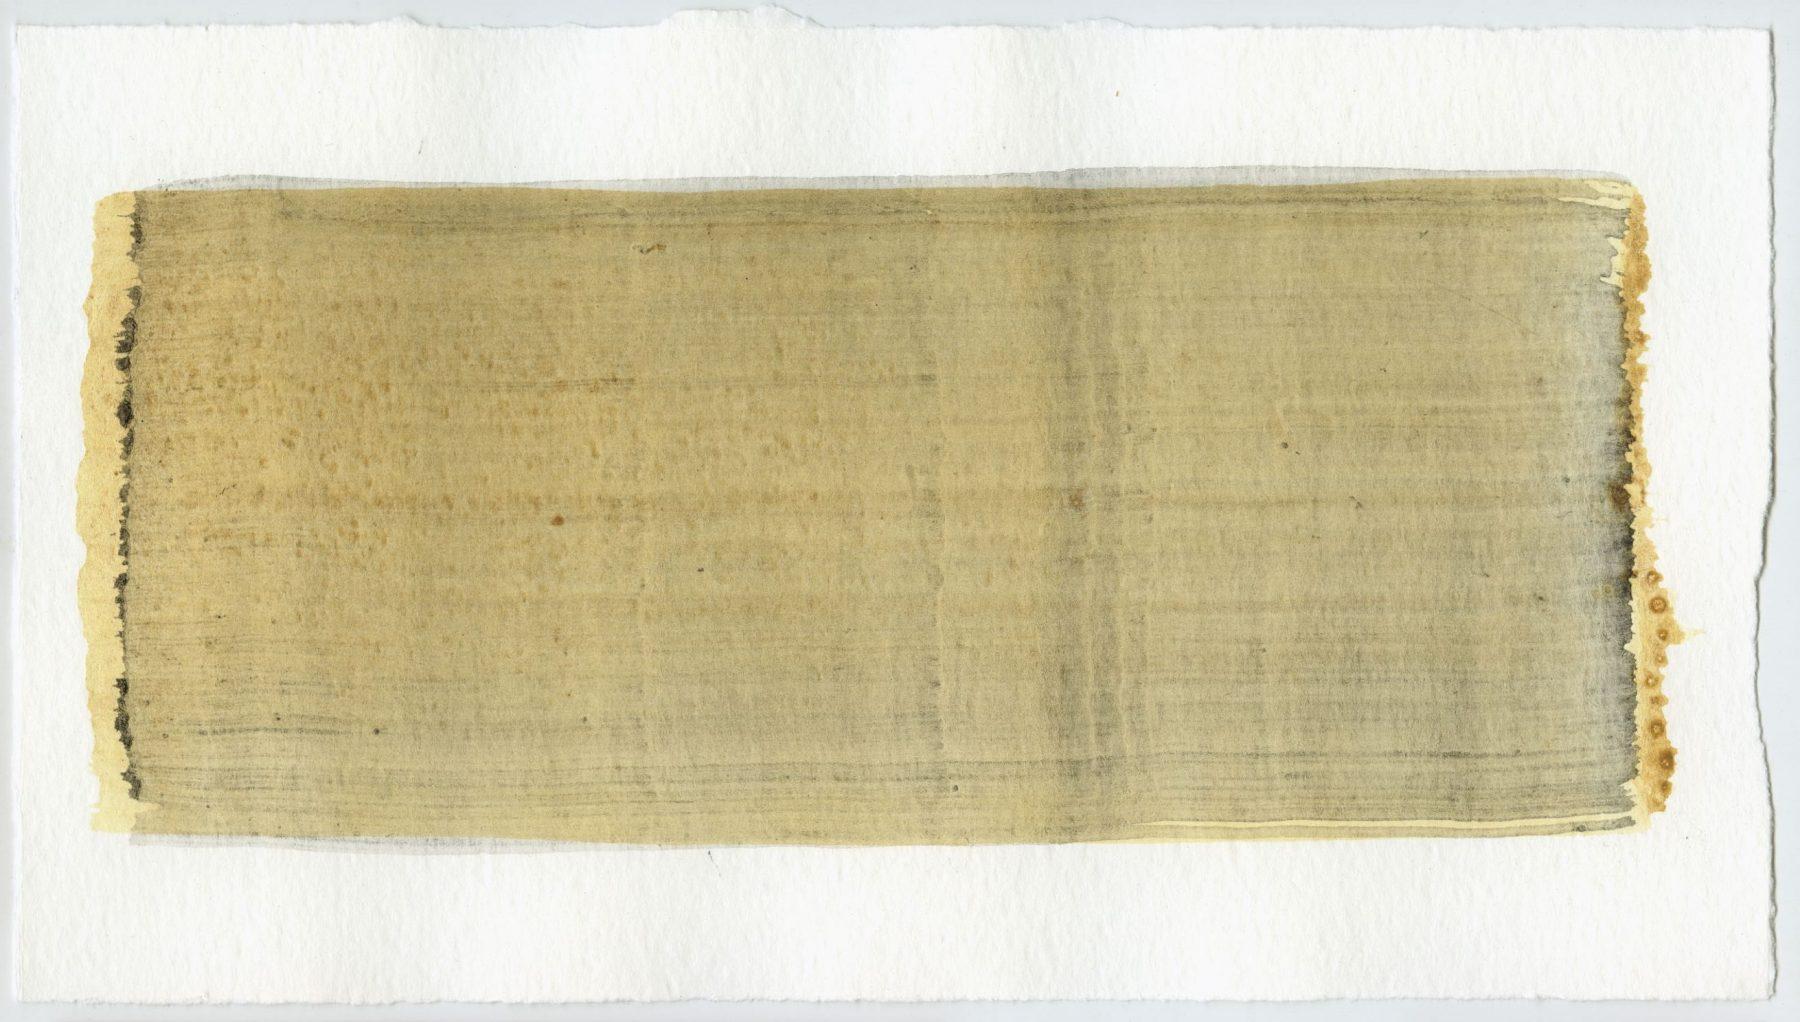 Brush stroke no. 55 - Selfmade pigment: IJzeroer, Slingerpad zwart